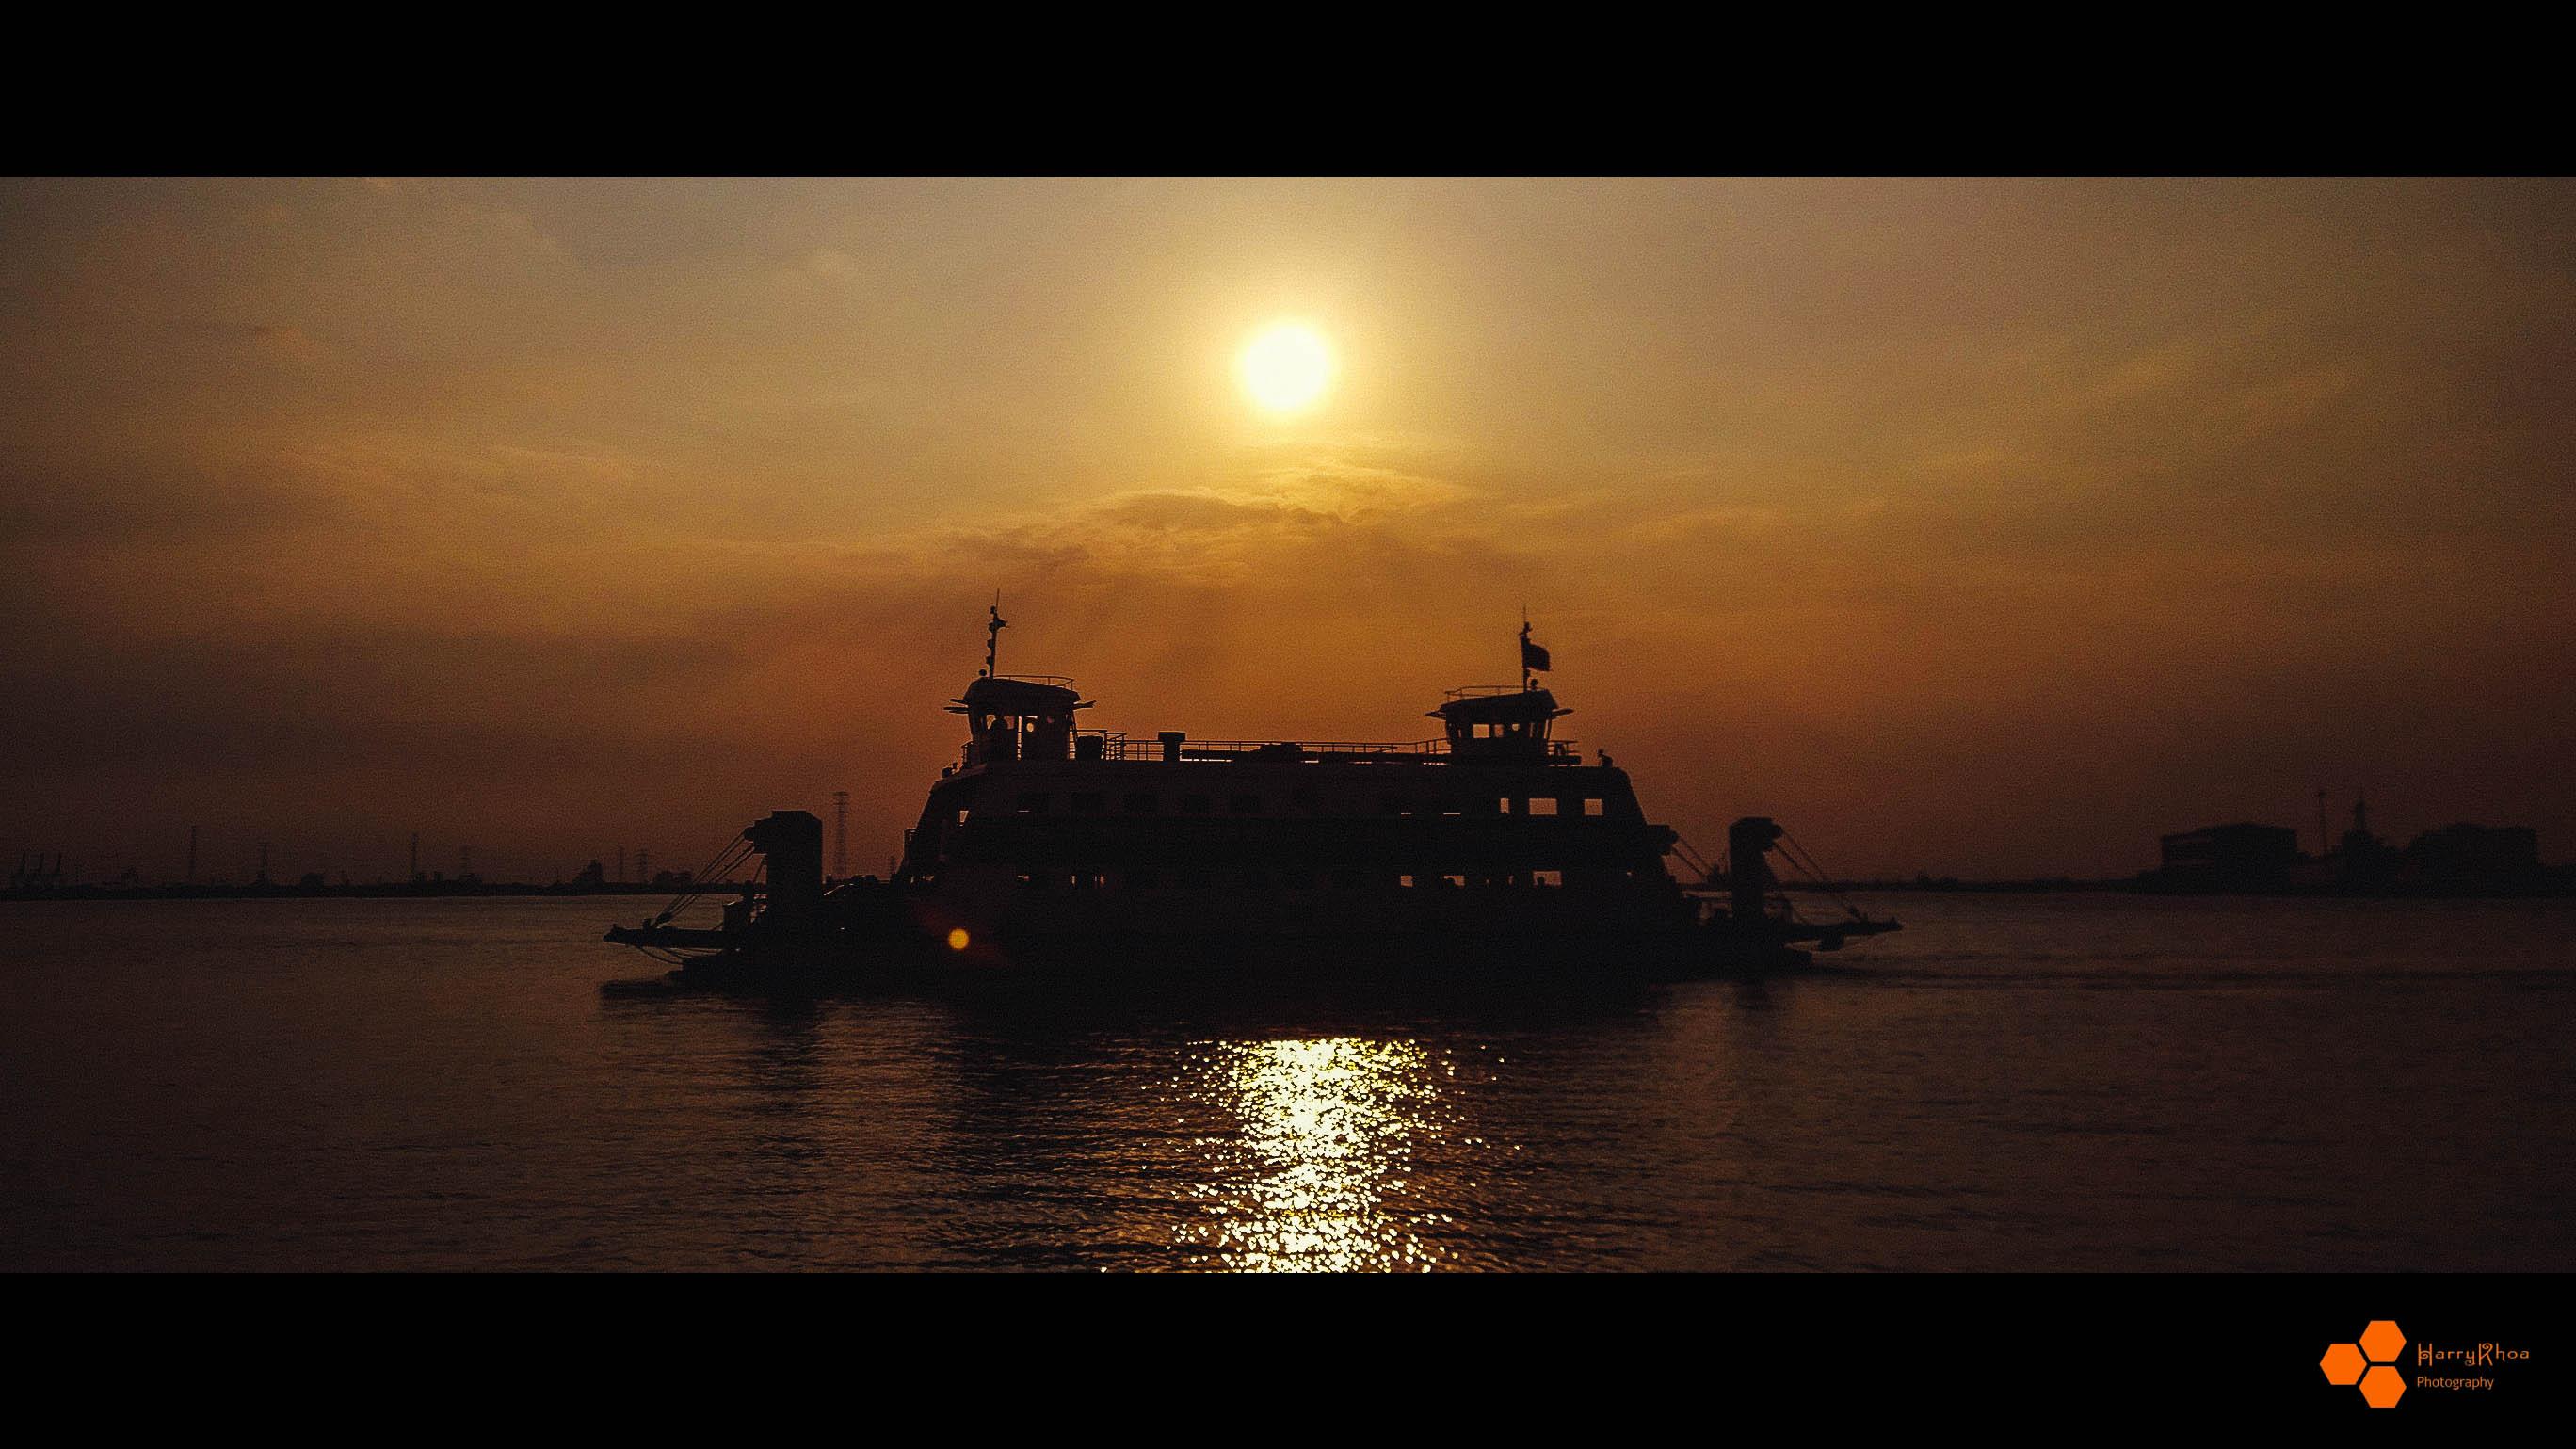 the-ferry_16879189418_o.jpg